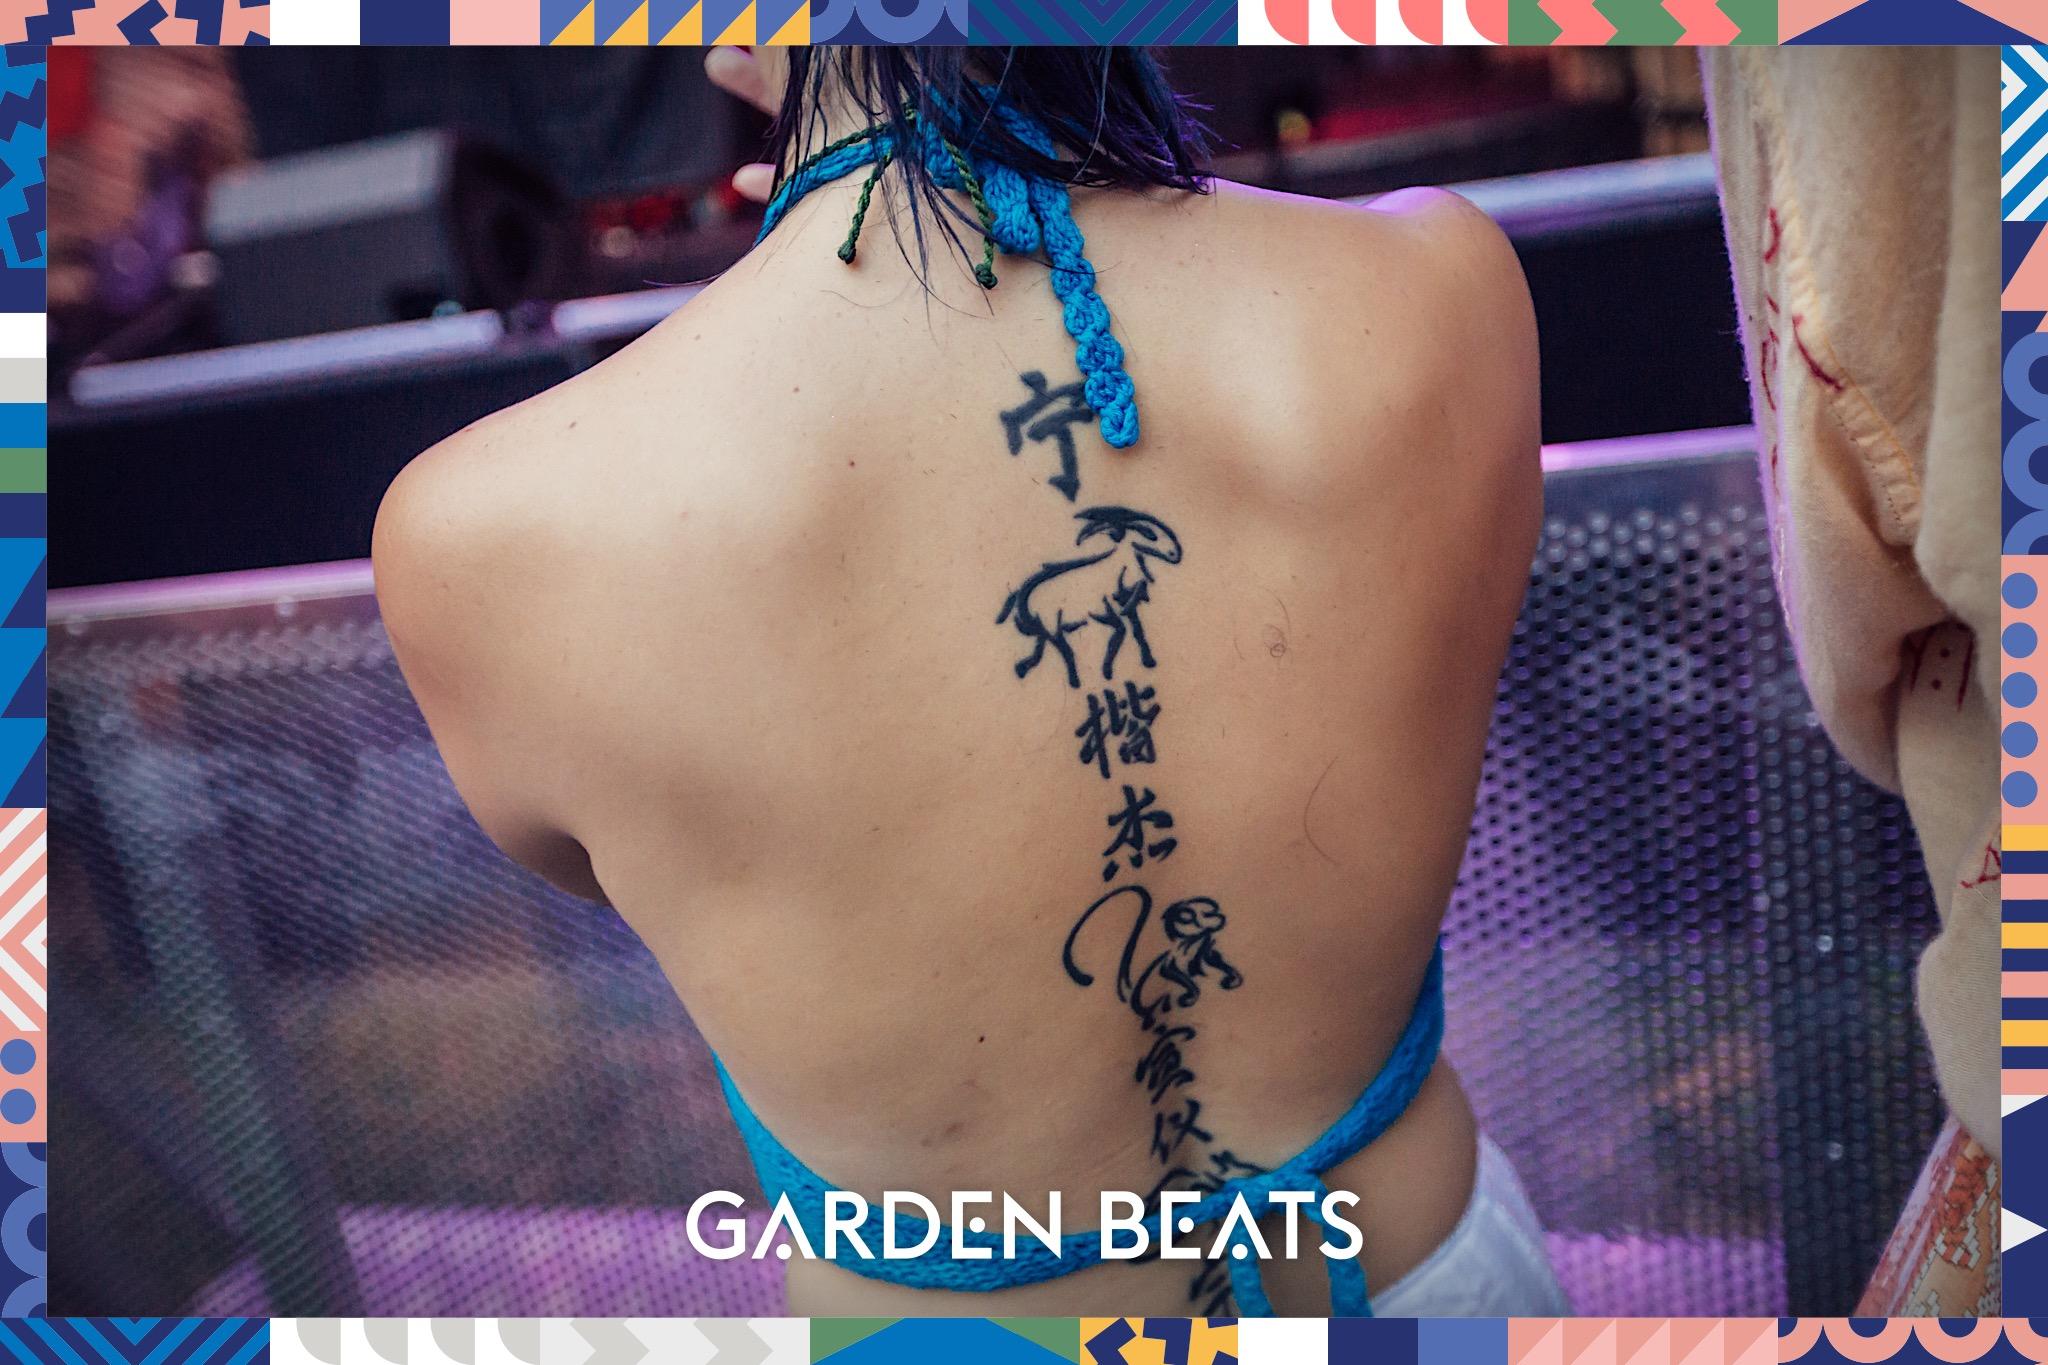 18032017_GardenBeats_Colossal688_WatermarkedGB.jpg